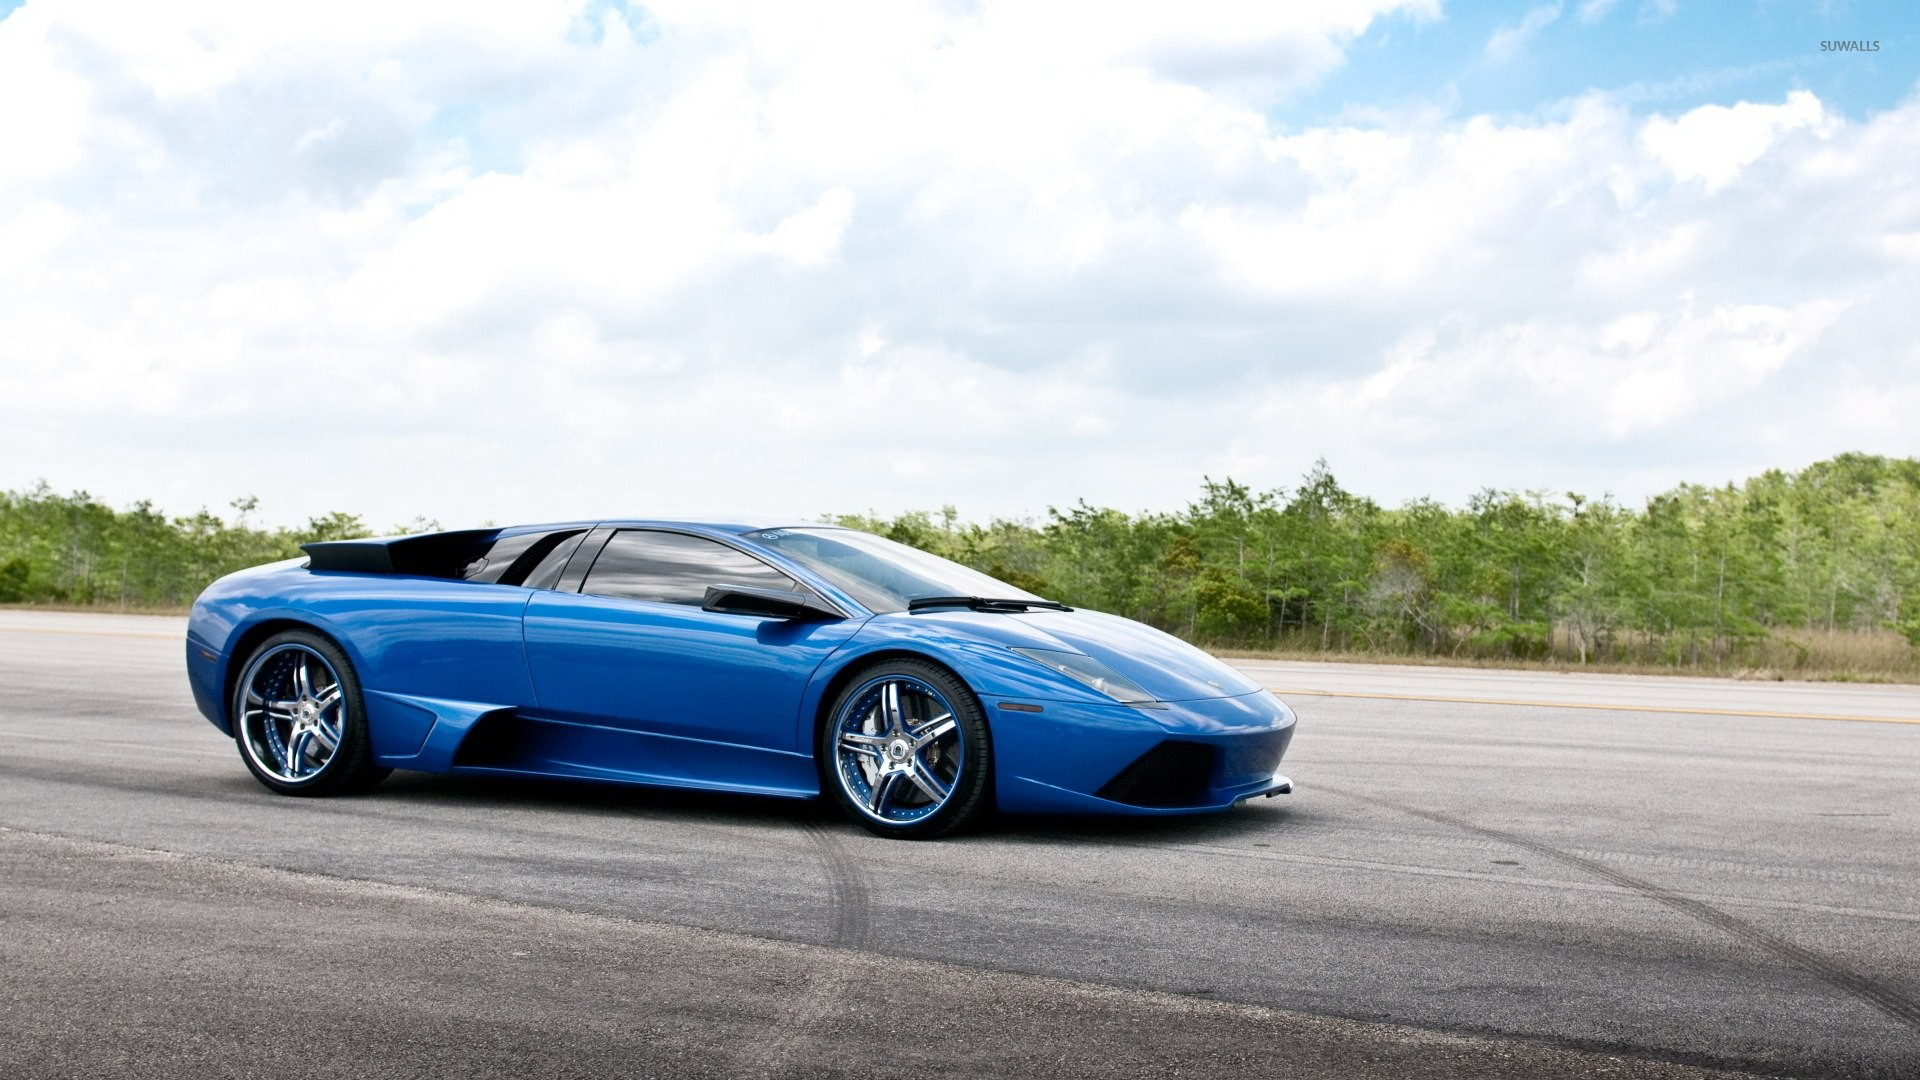 Blue Lamborghini Aventador Wallpaper Car Wallpapers 49062